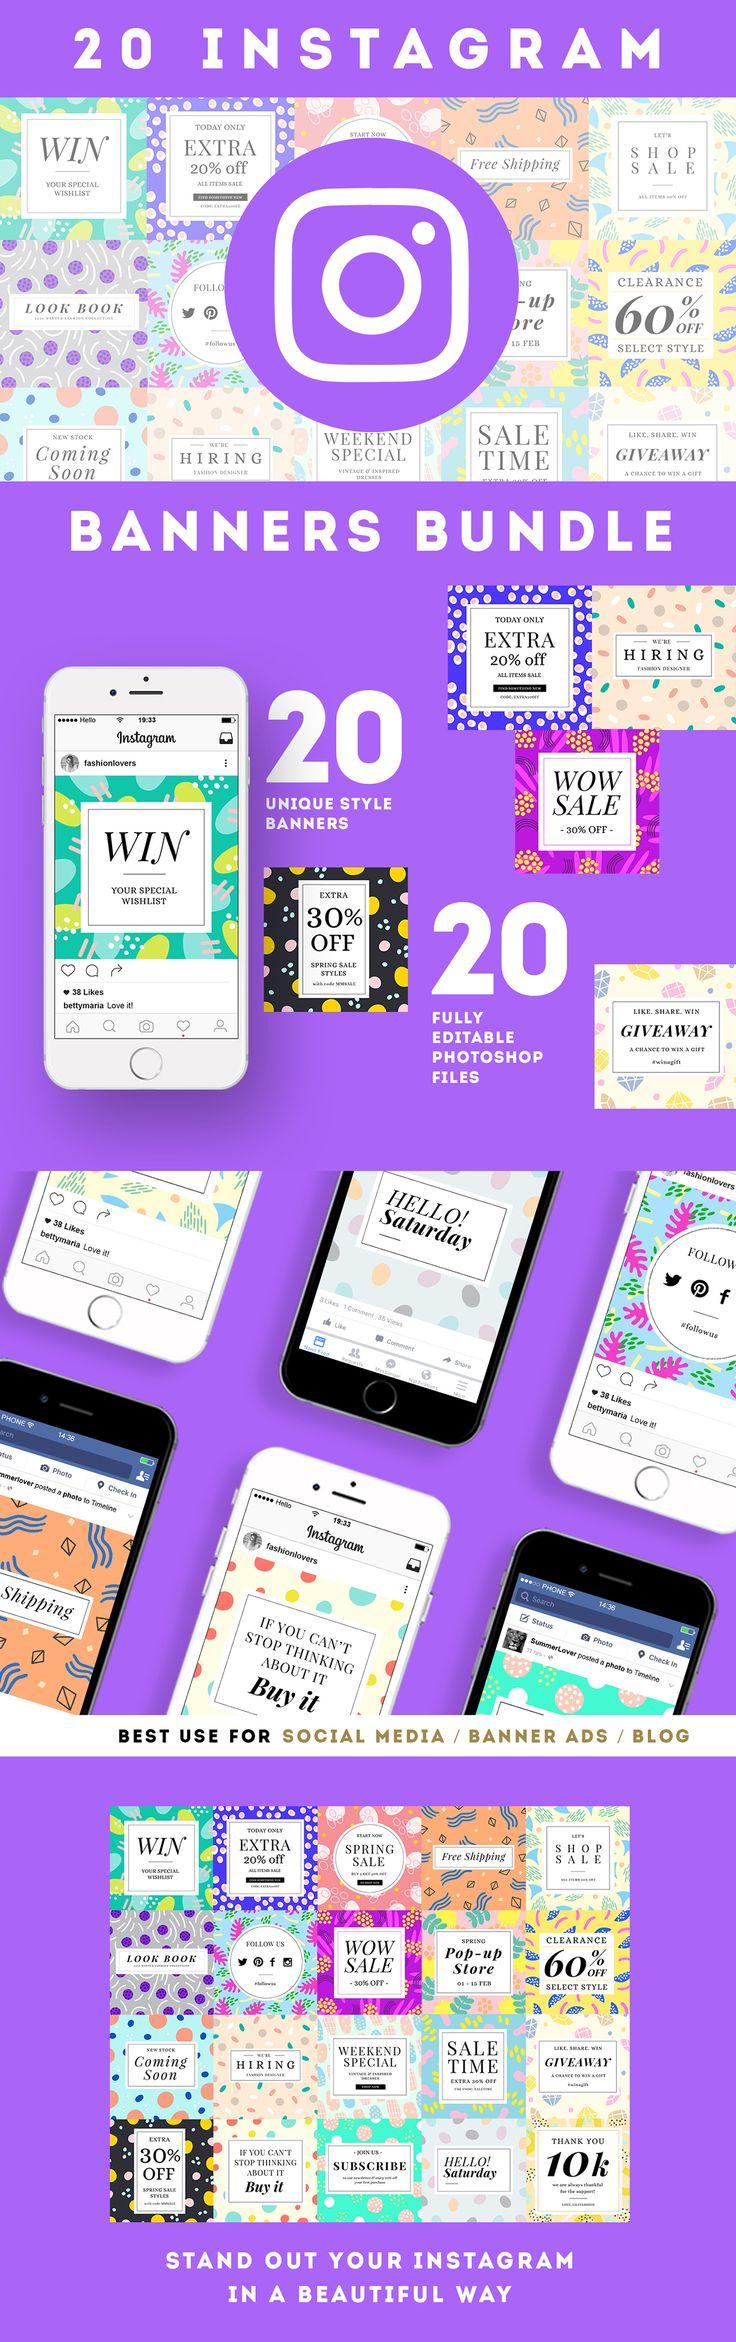 20 Instagram Banners / Social Media Banner Templates Bundle B